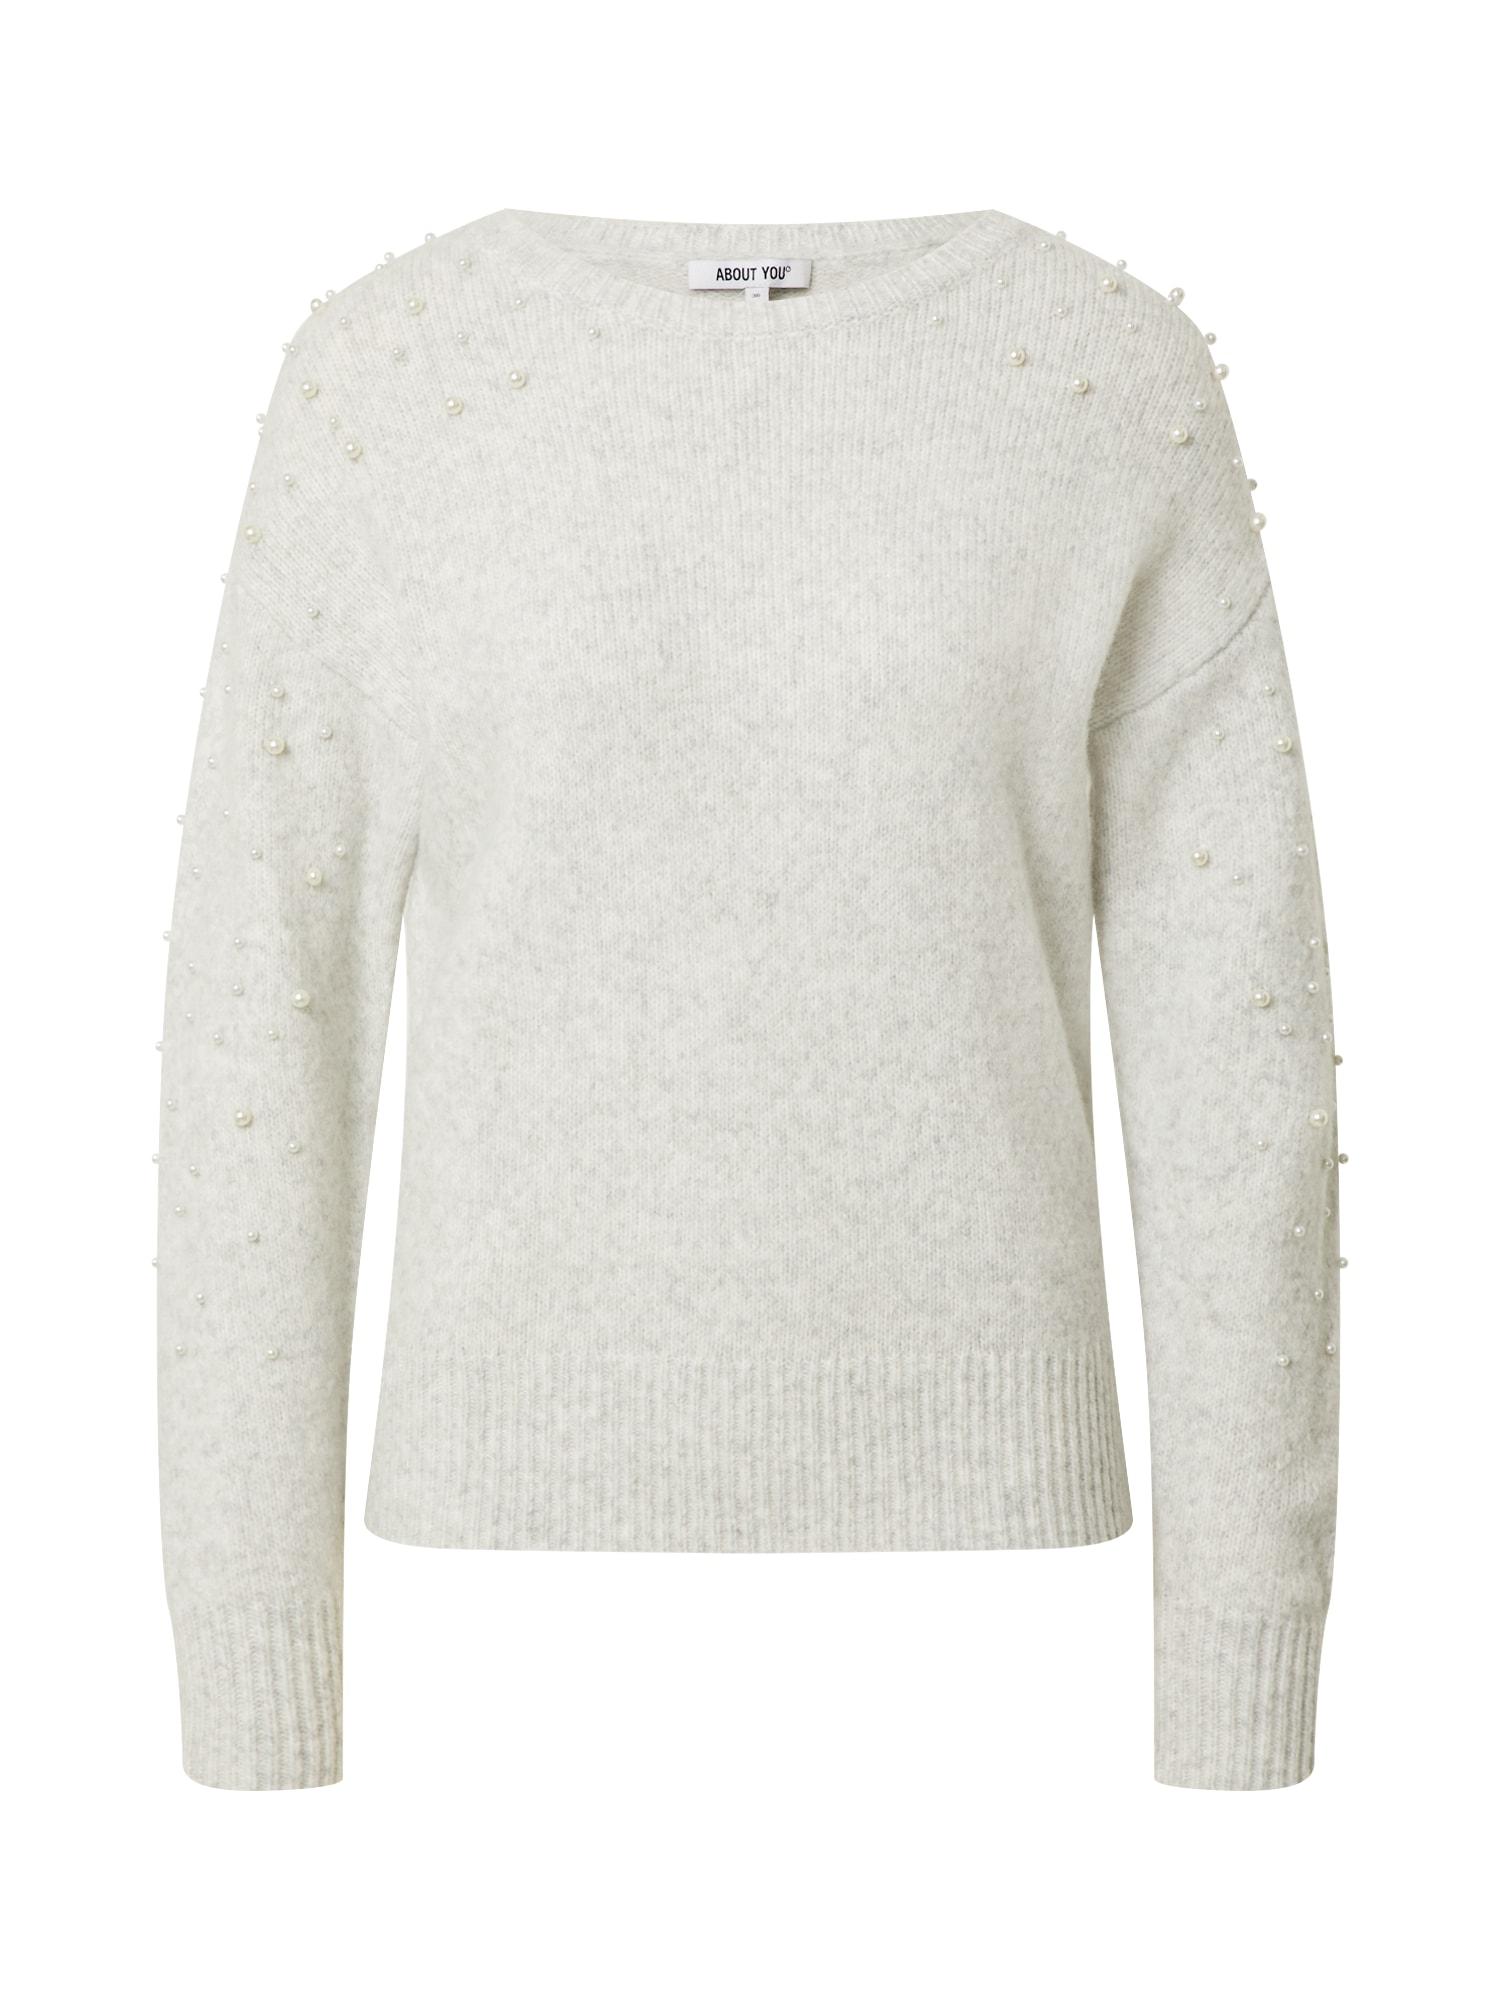 ABOUT YOU Megztinis 'Lusan' margai pilka